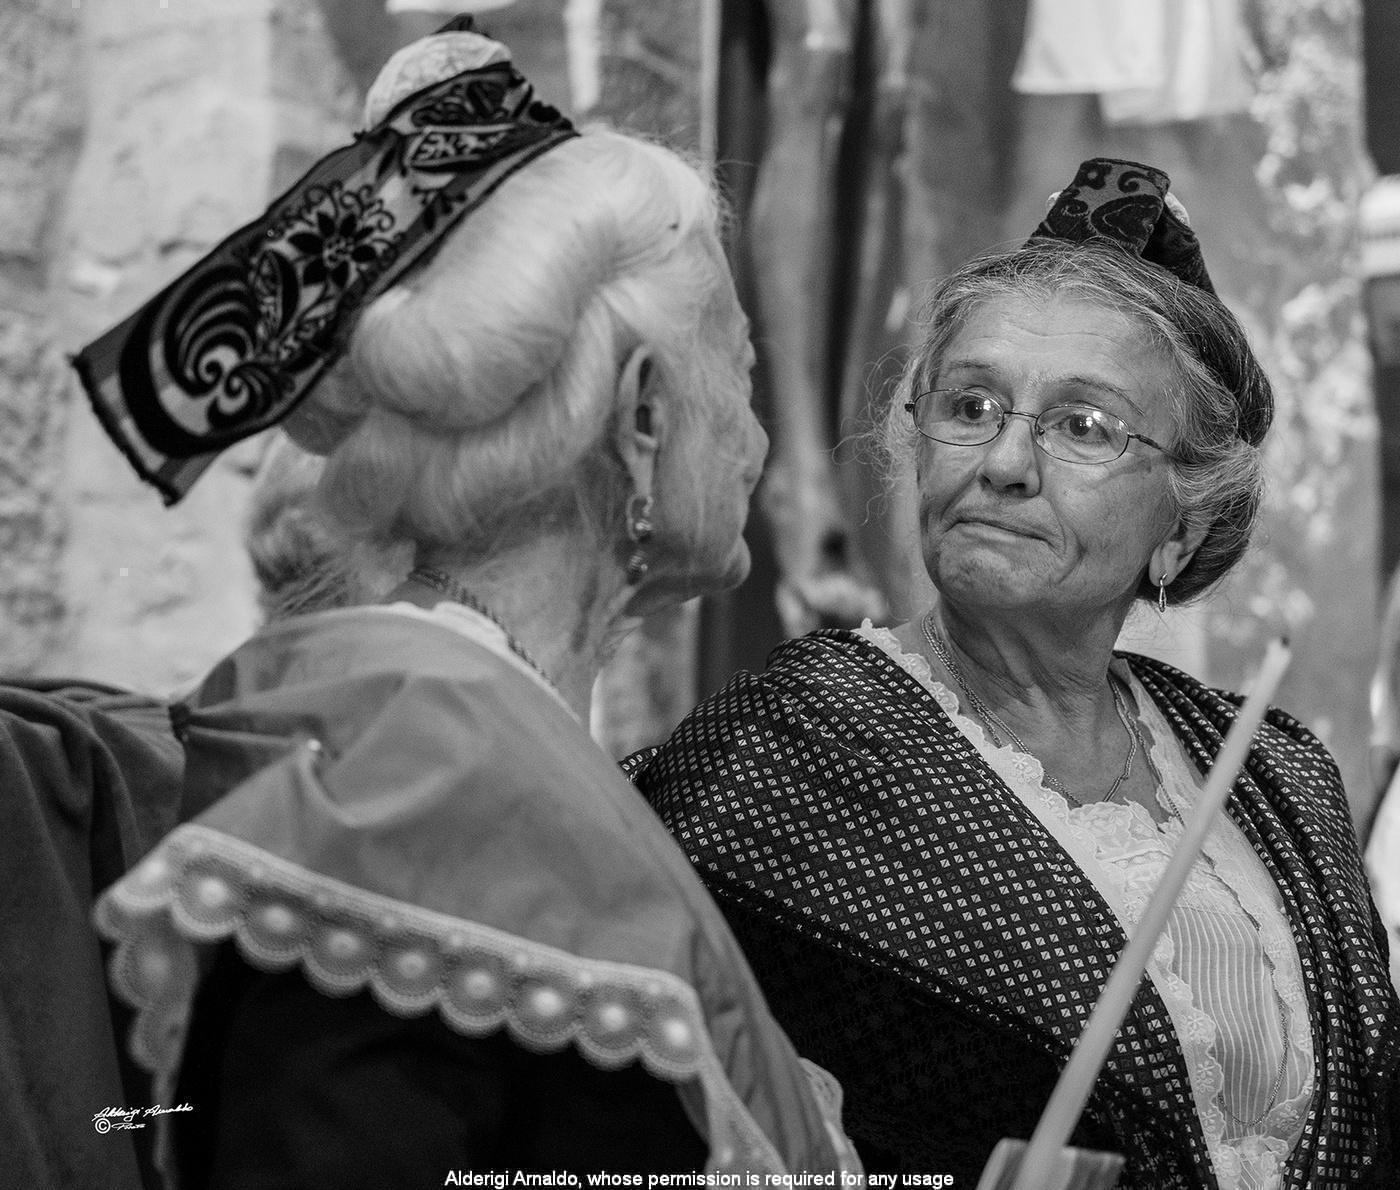 Alderigi Arnaldo Fotografo - PORTRAITS - Photo Gallery